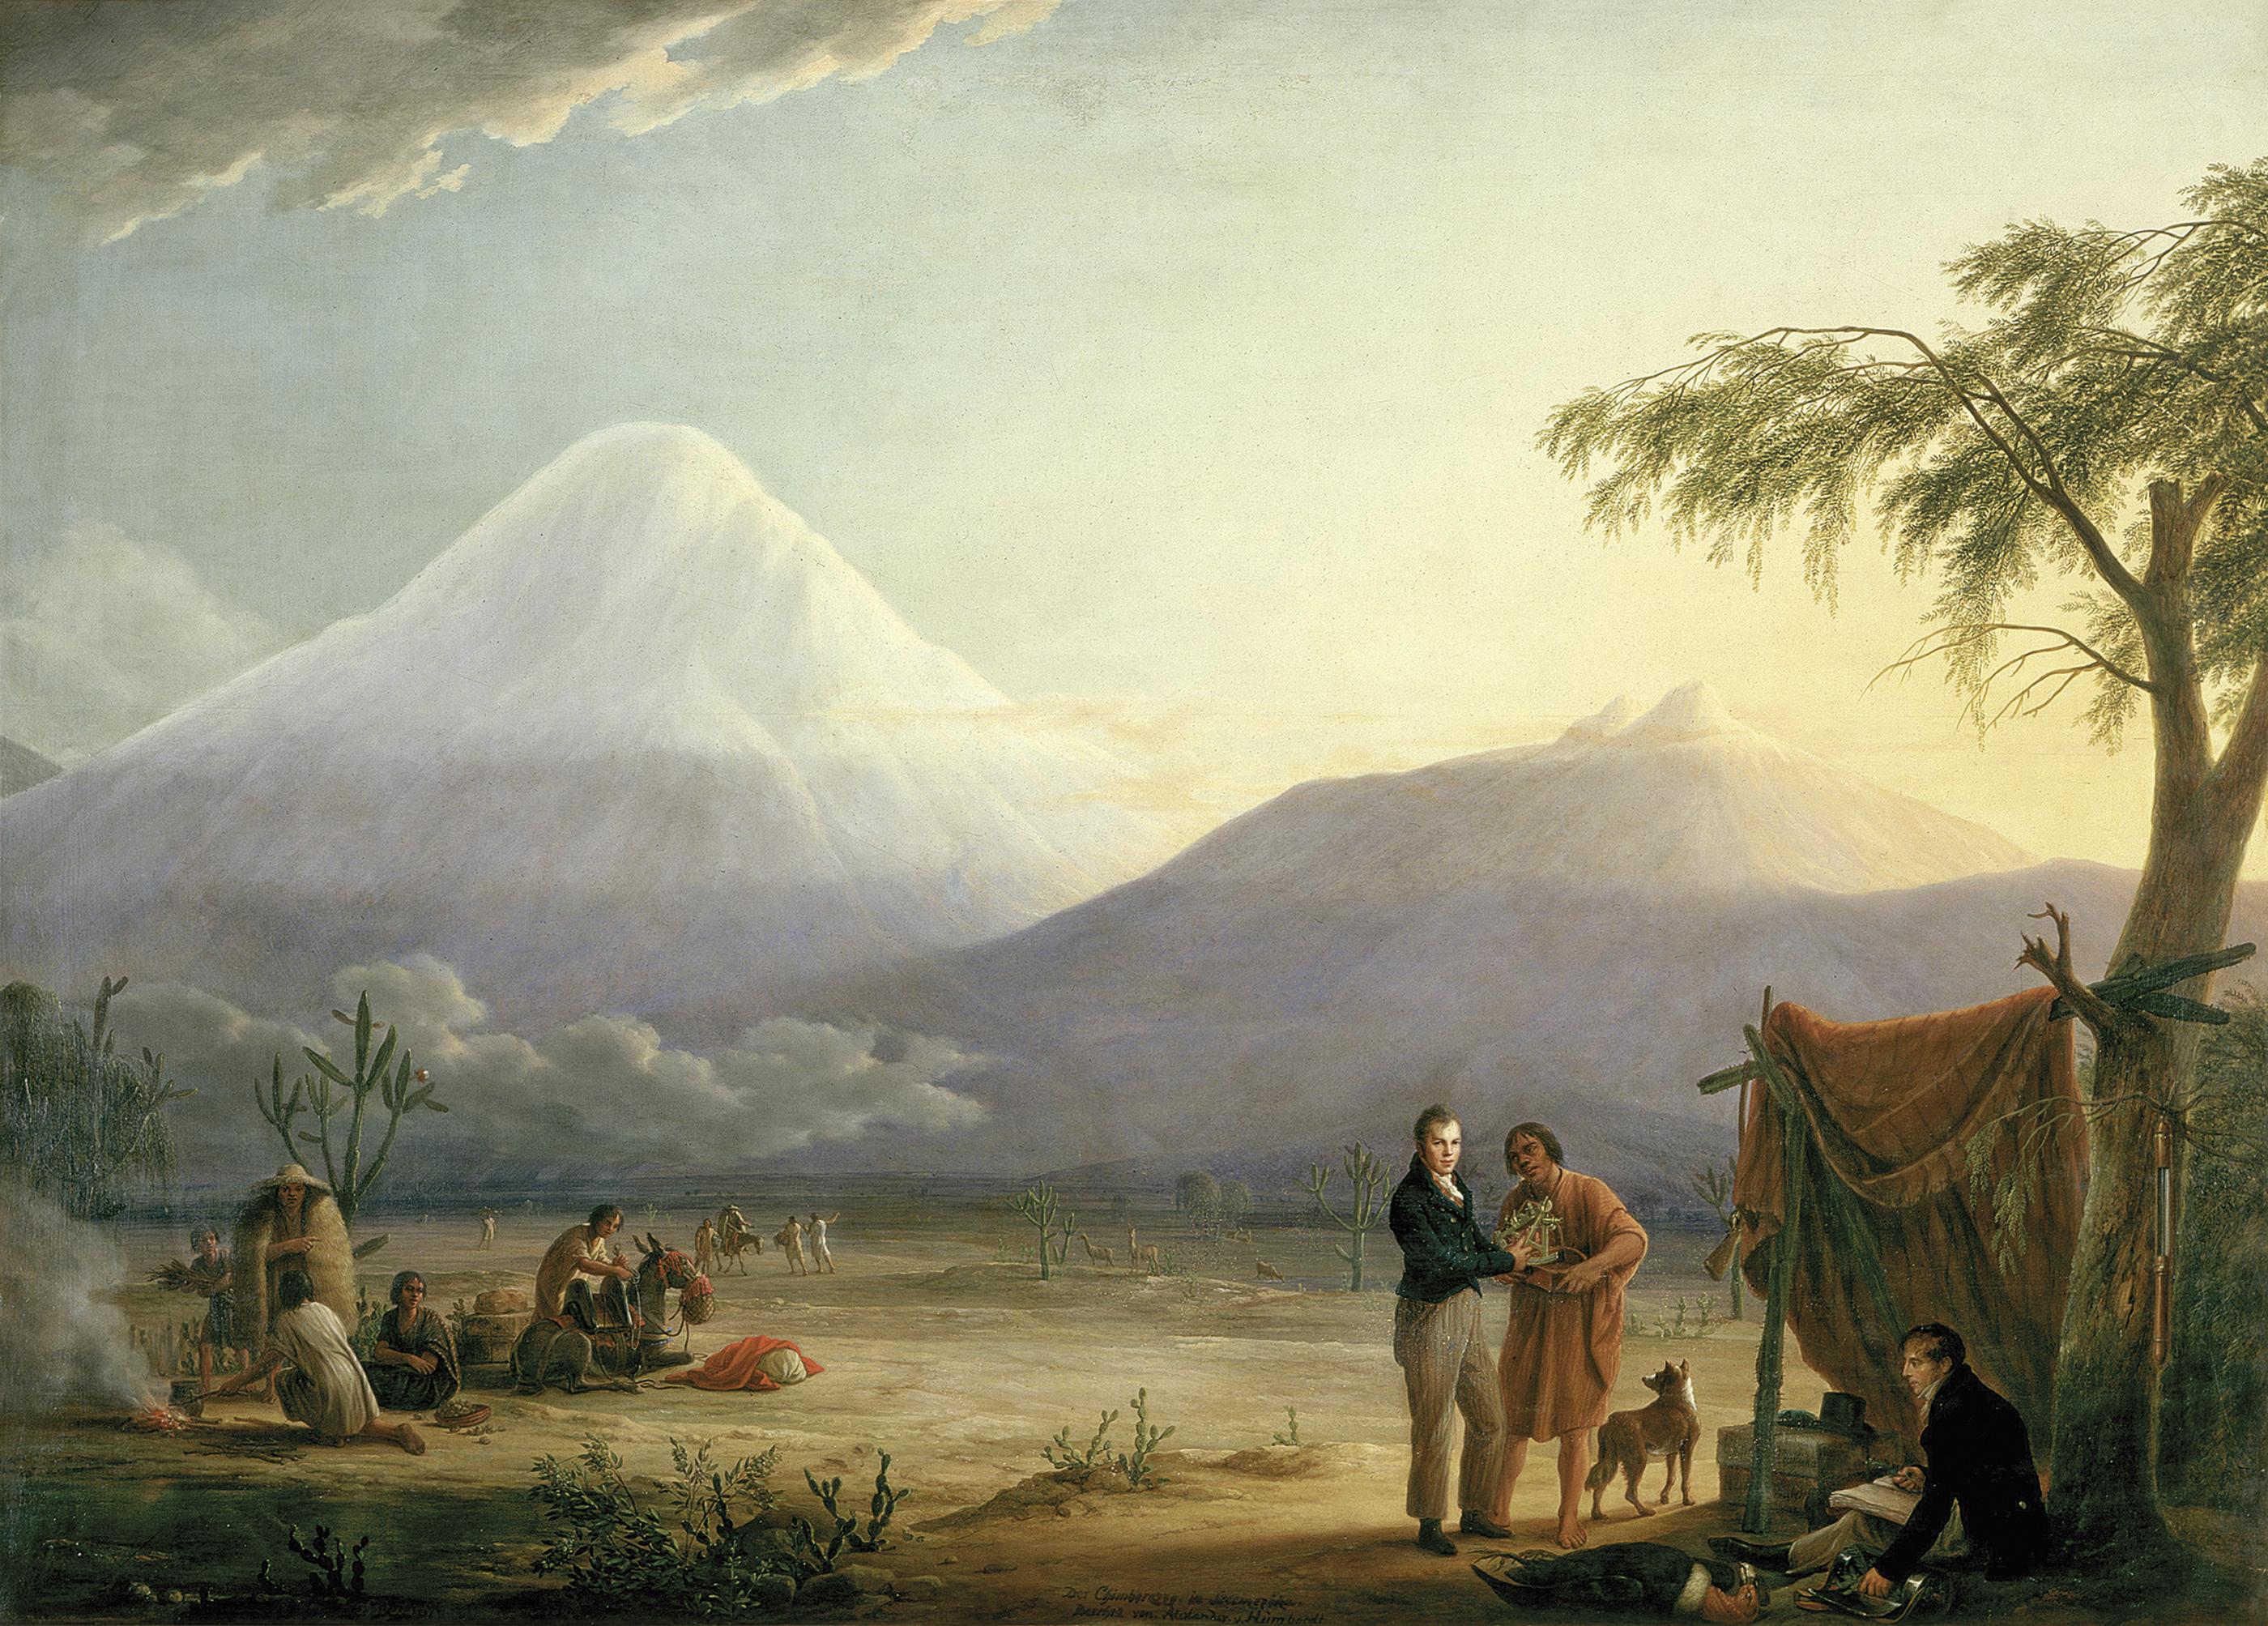 File:Humboldt-Bonpland Chimborazo.jpg